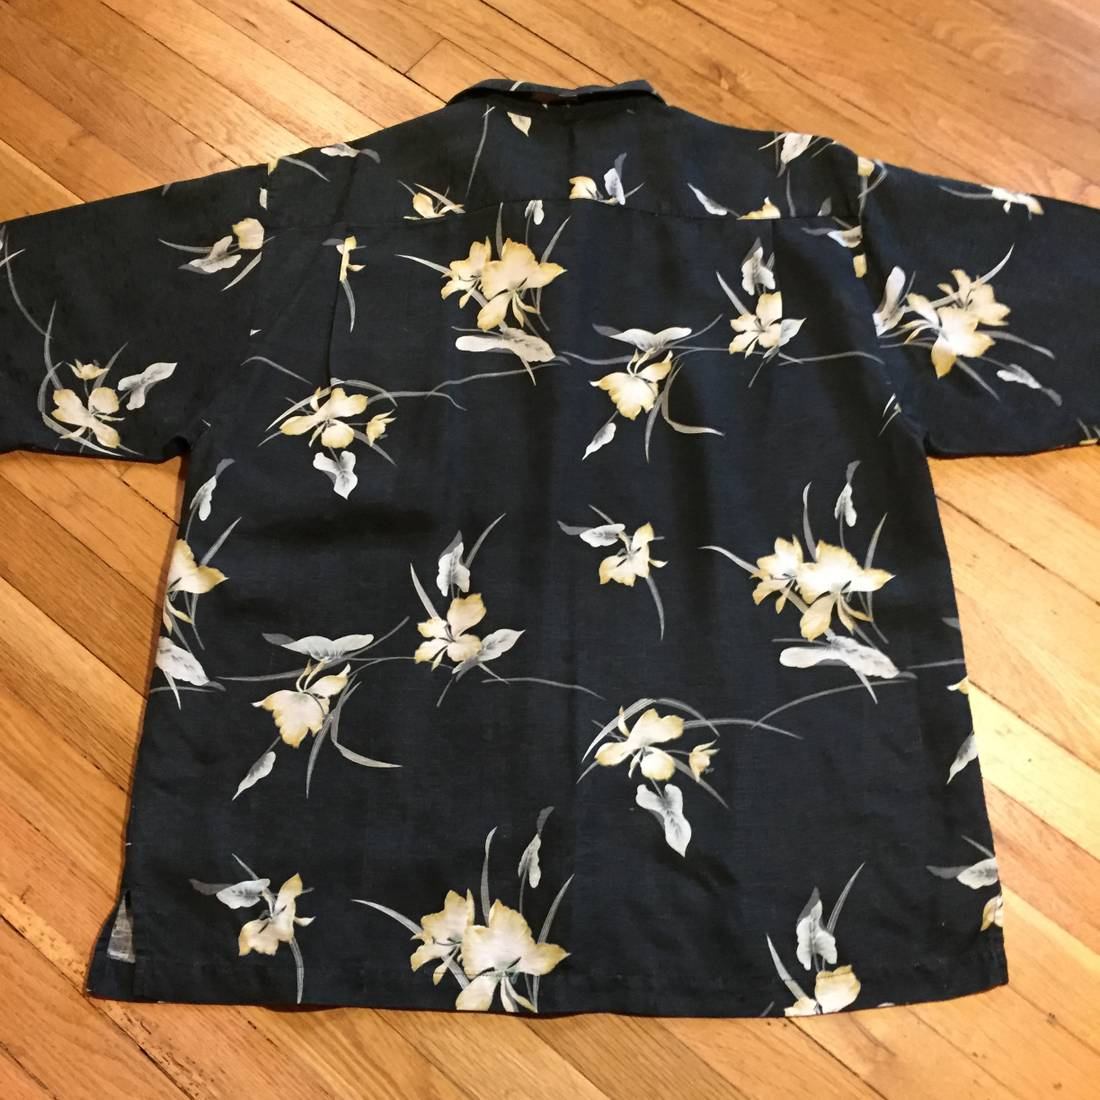 a6db53f7d287 Quality Hawaiian Shirts Uk | Top Mode Depot